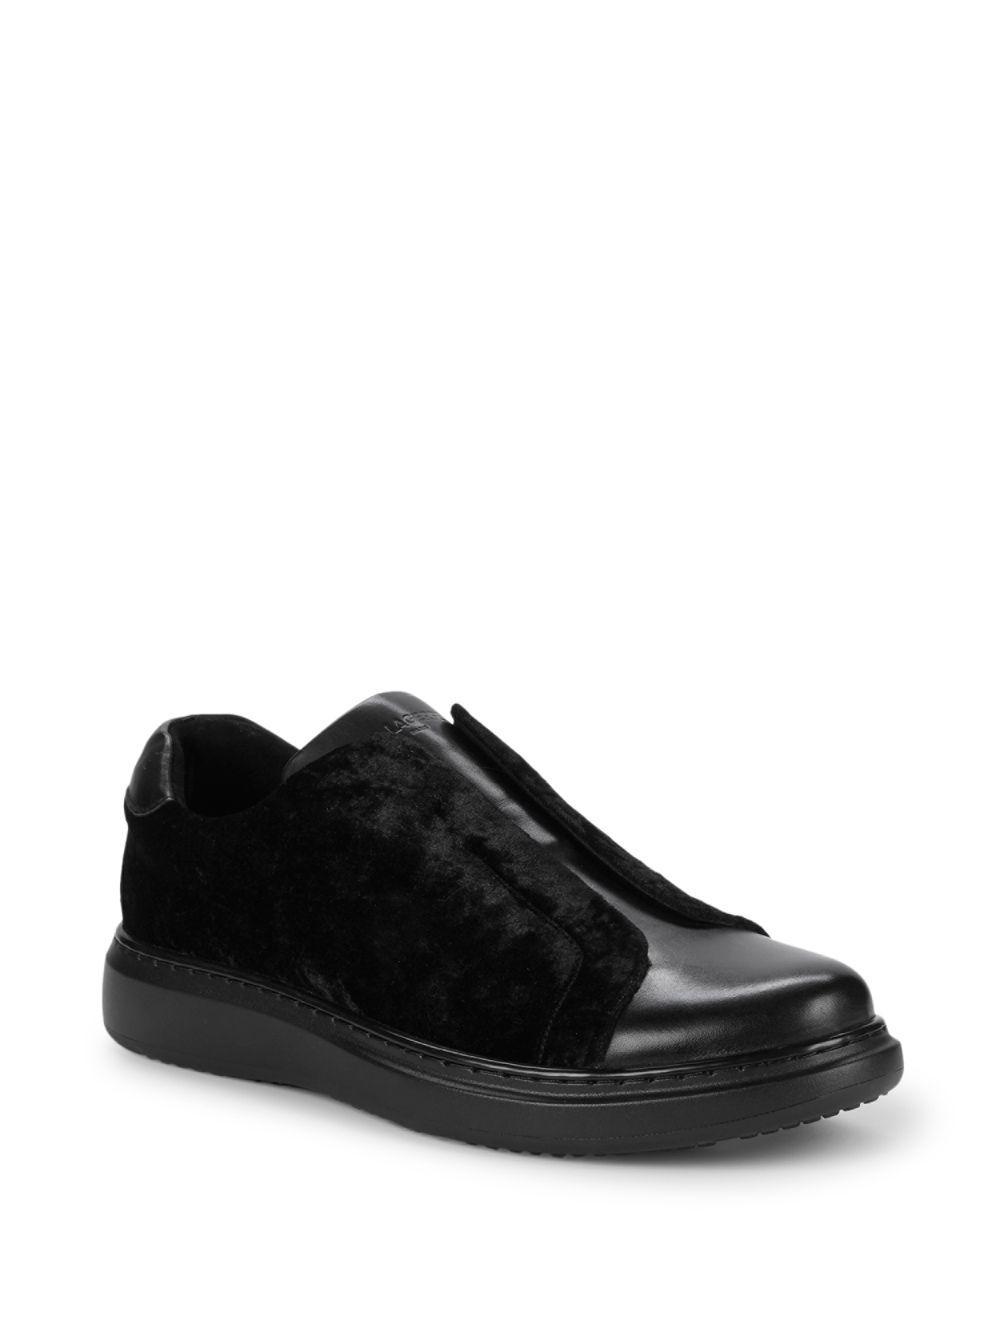 b60a37ca58a8 Lyst - Karl Lagerfeld Leather   Velvet Sneakers in Black for Men